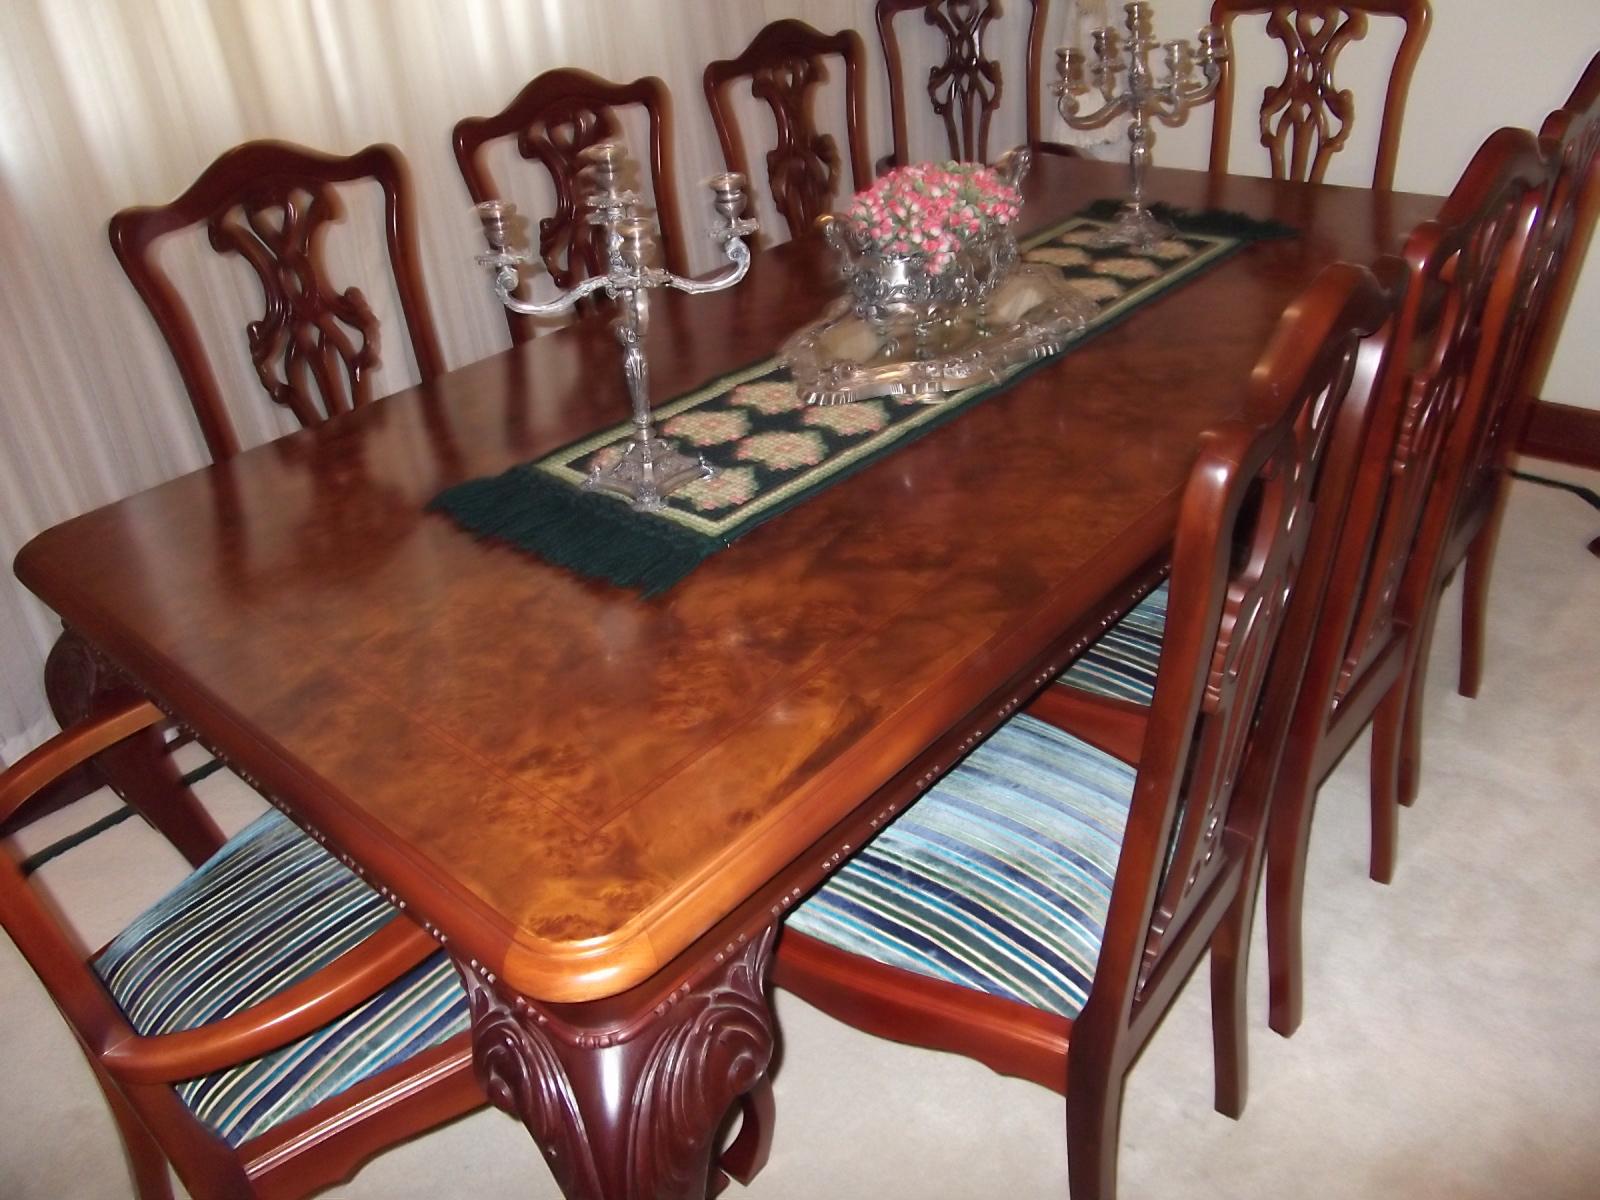 Sala de Jantar cadeira jantar cadeiras jantar cadeiras fabrica de  #A64825 1600x1200